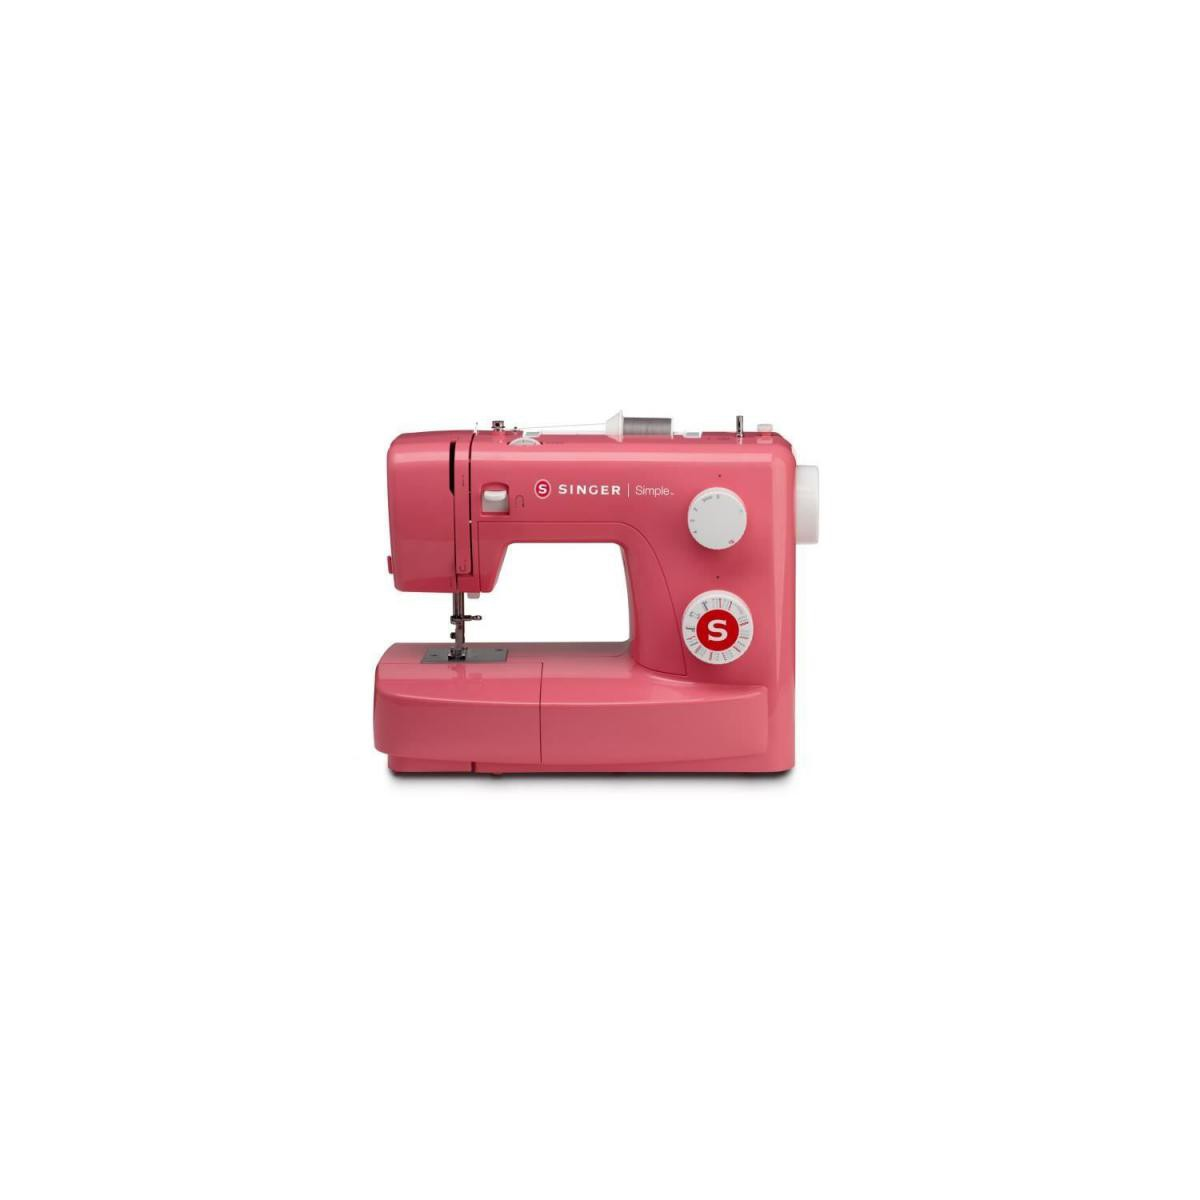 Singer SINGER 43218 Machine a coudre SIMPLE 3223 - 70W - 23 points - Rouge